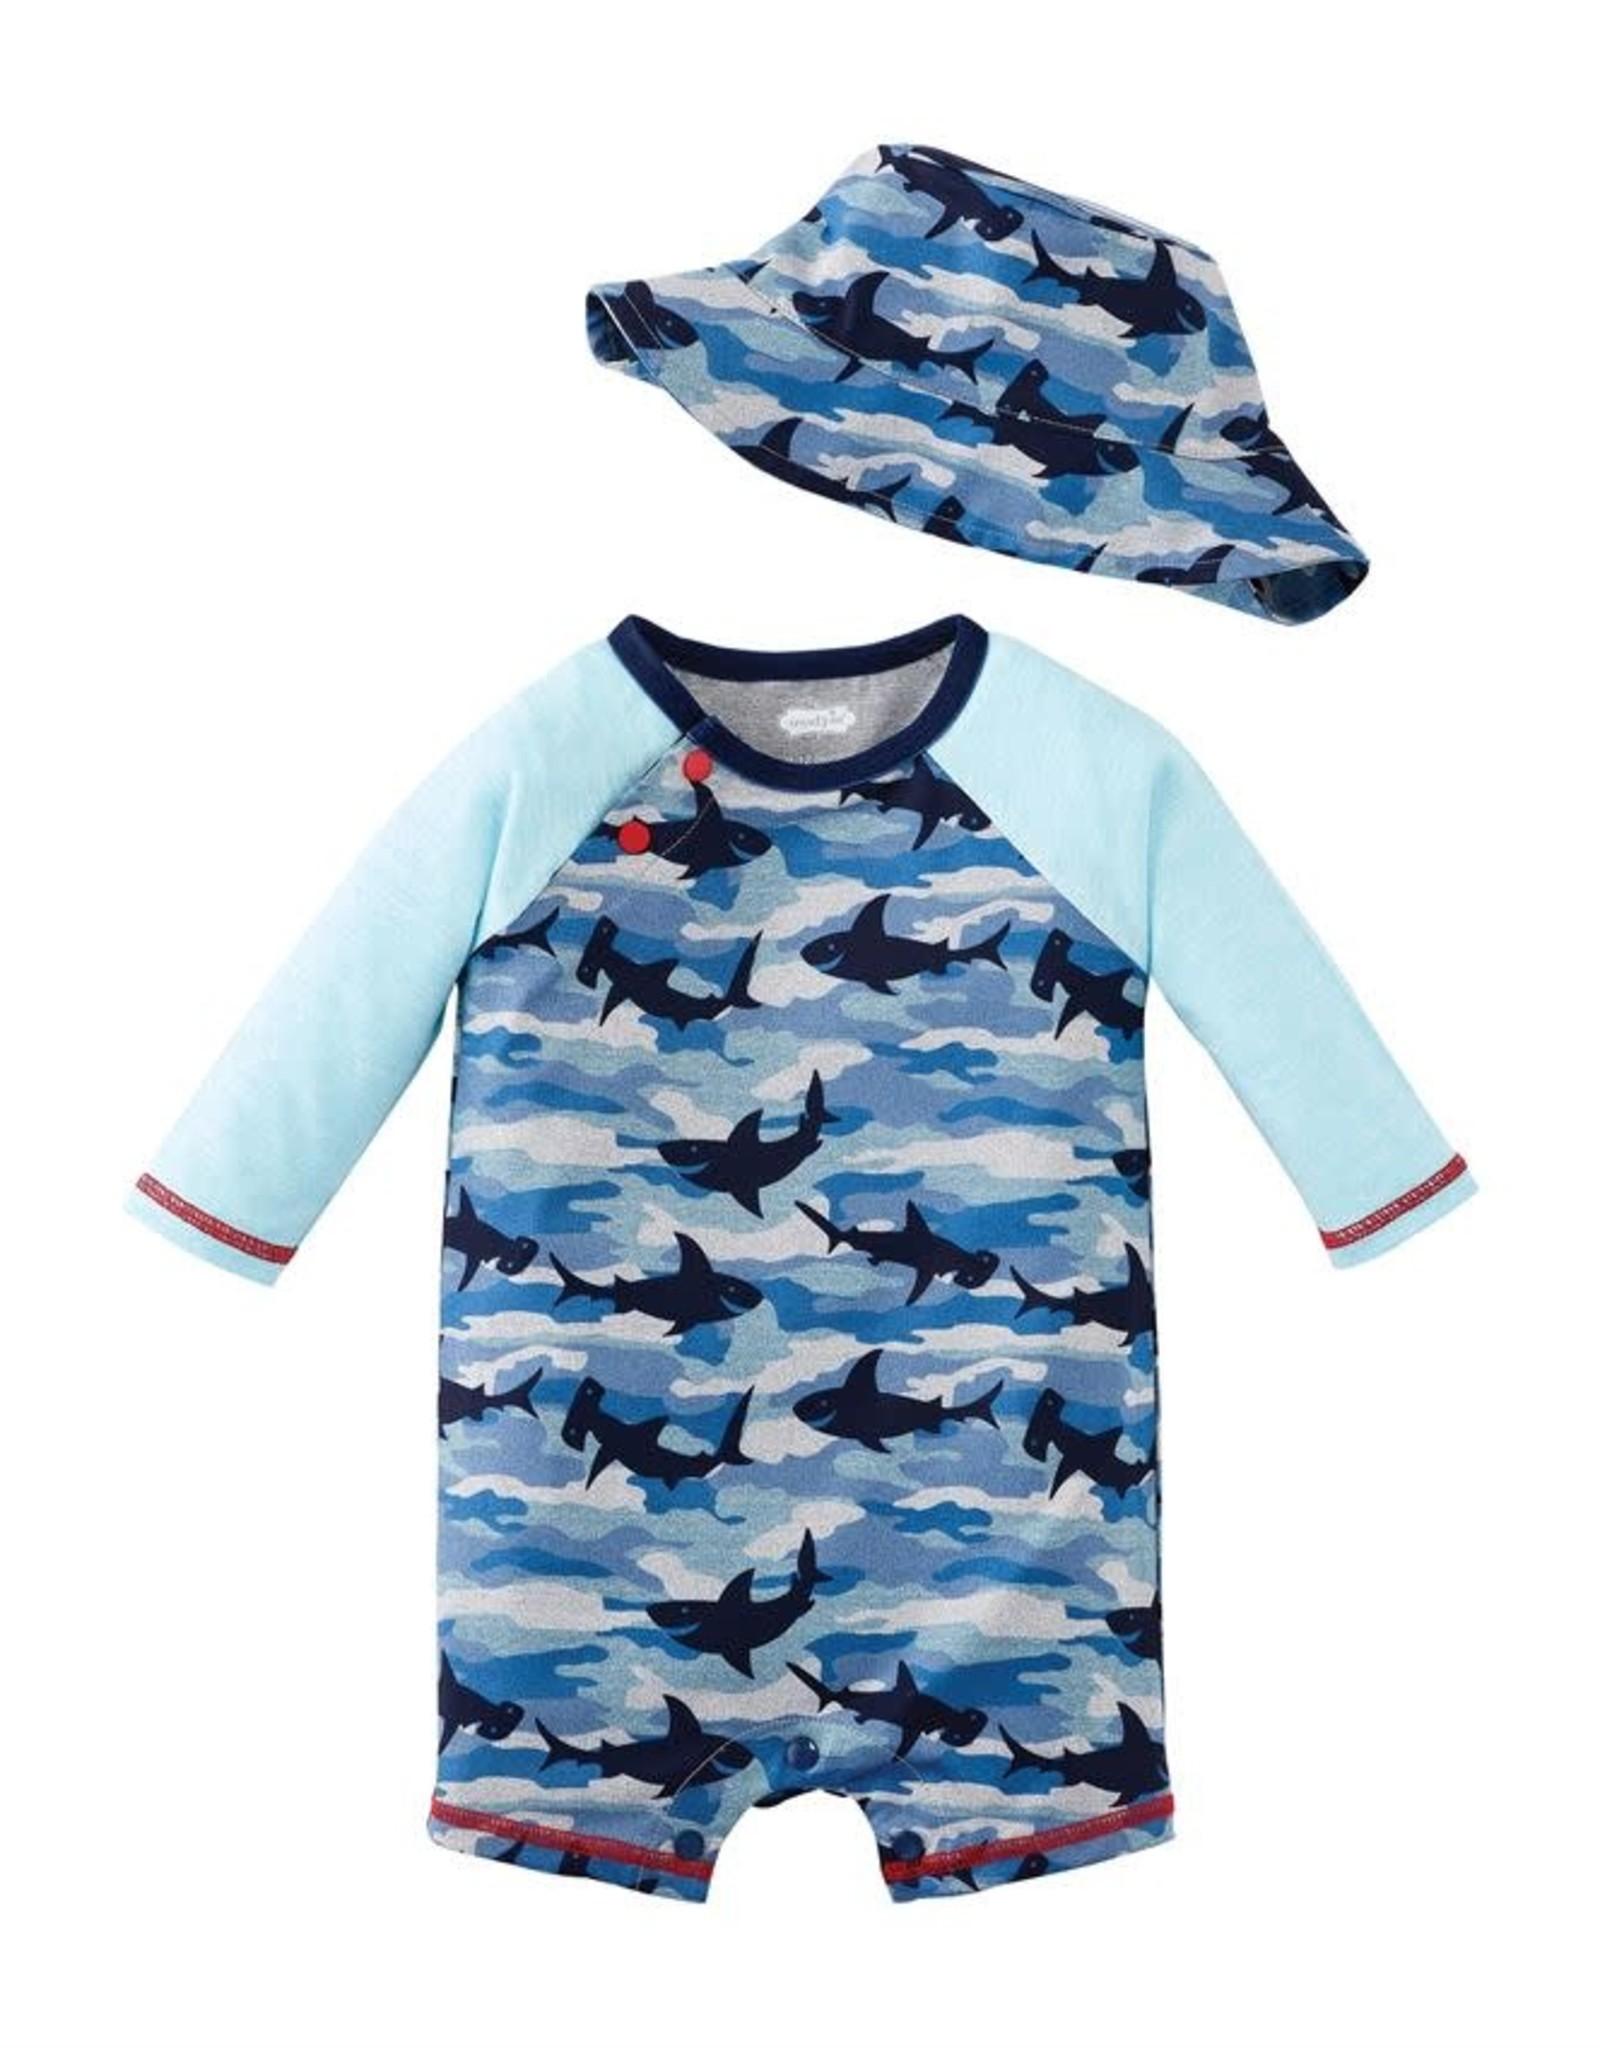 Shark Camo Rashguard 1pc